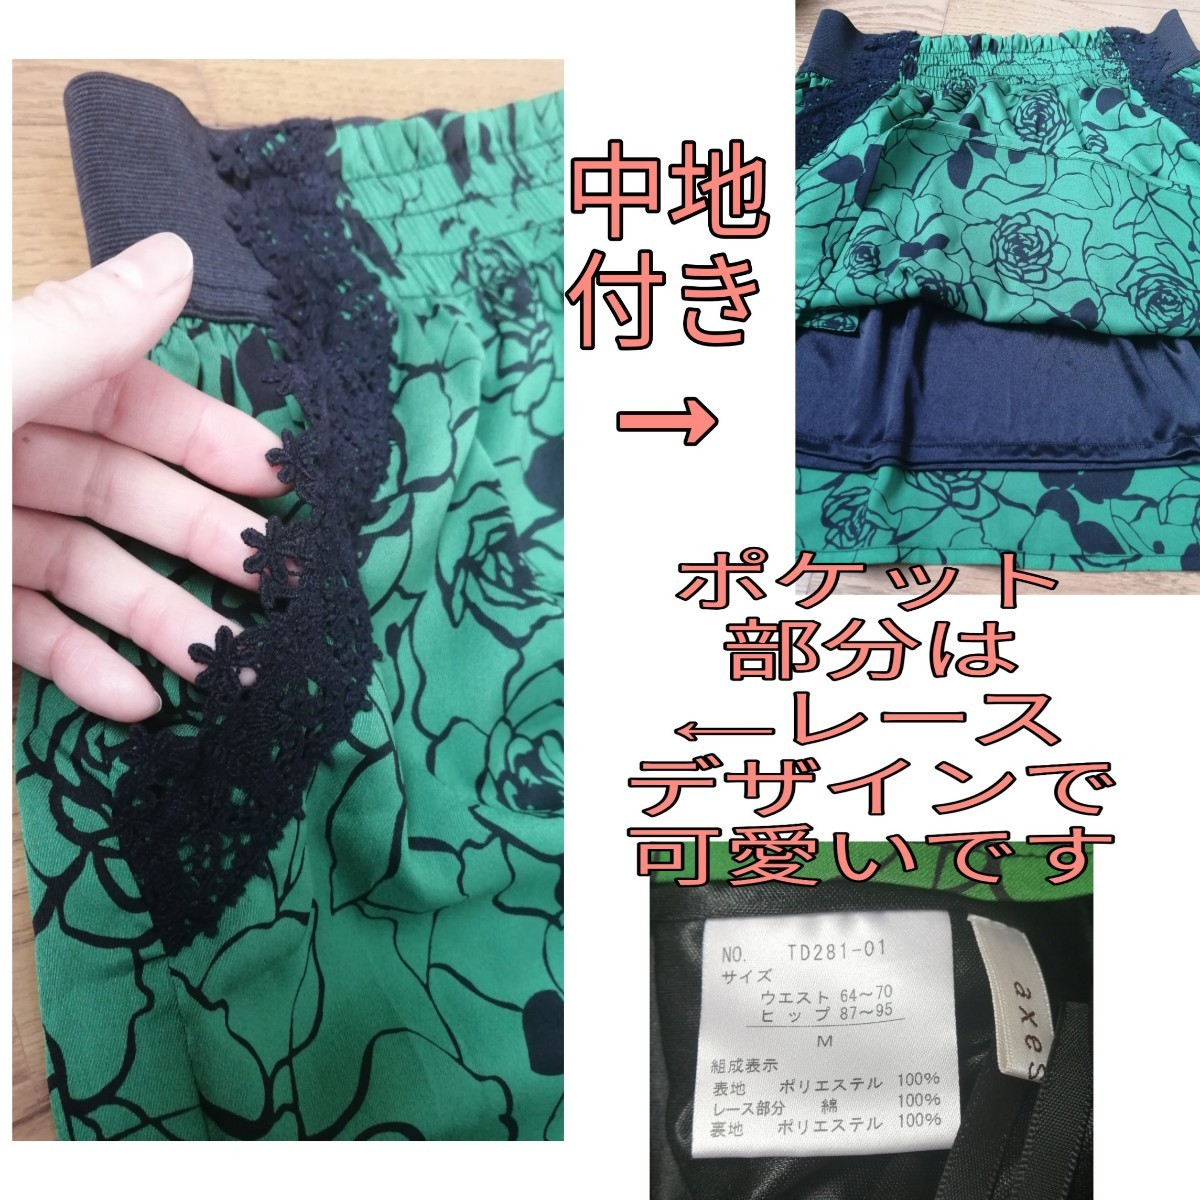 Axes femme スカート ミニスカート レディースファッション Mサイズ